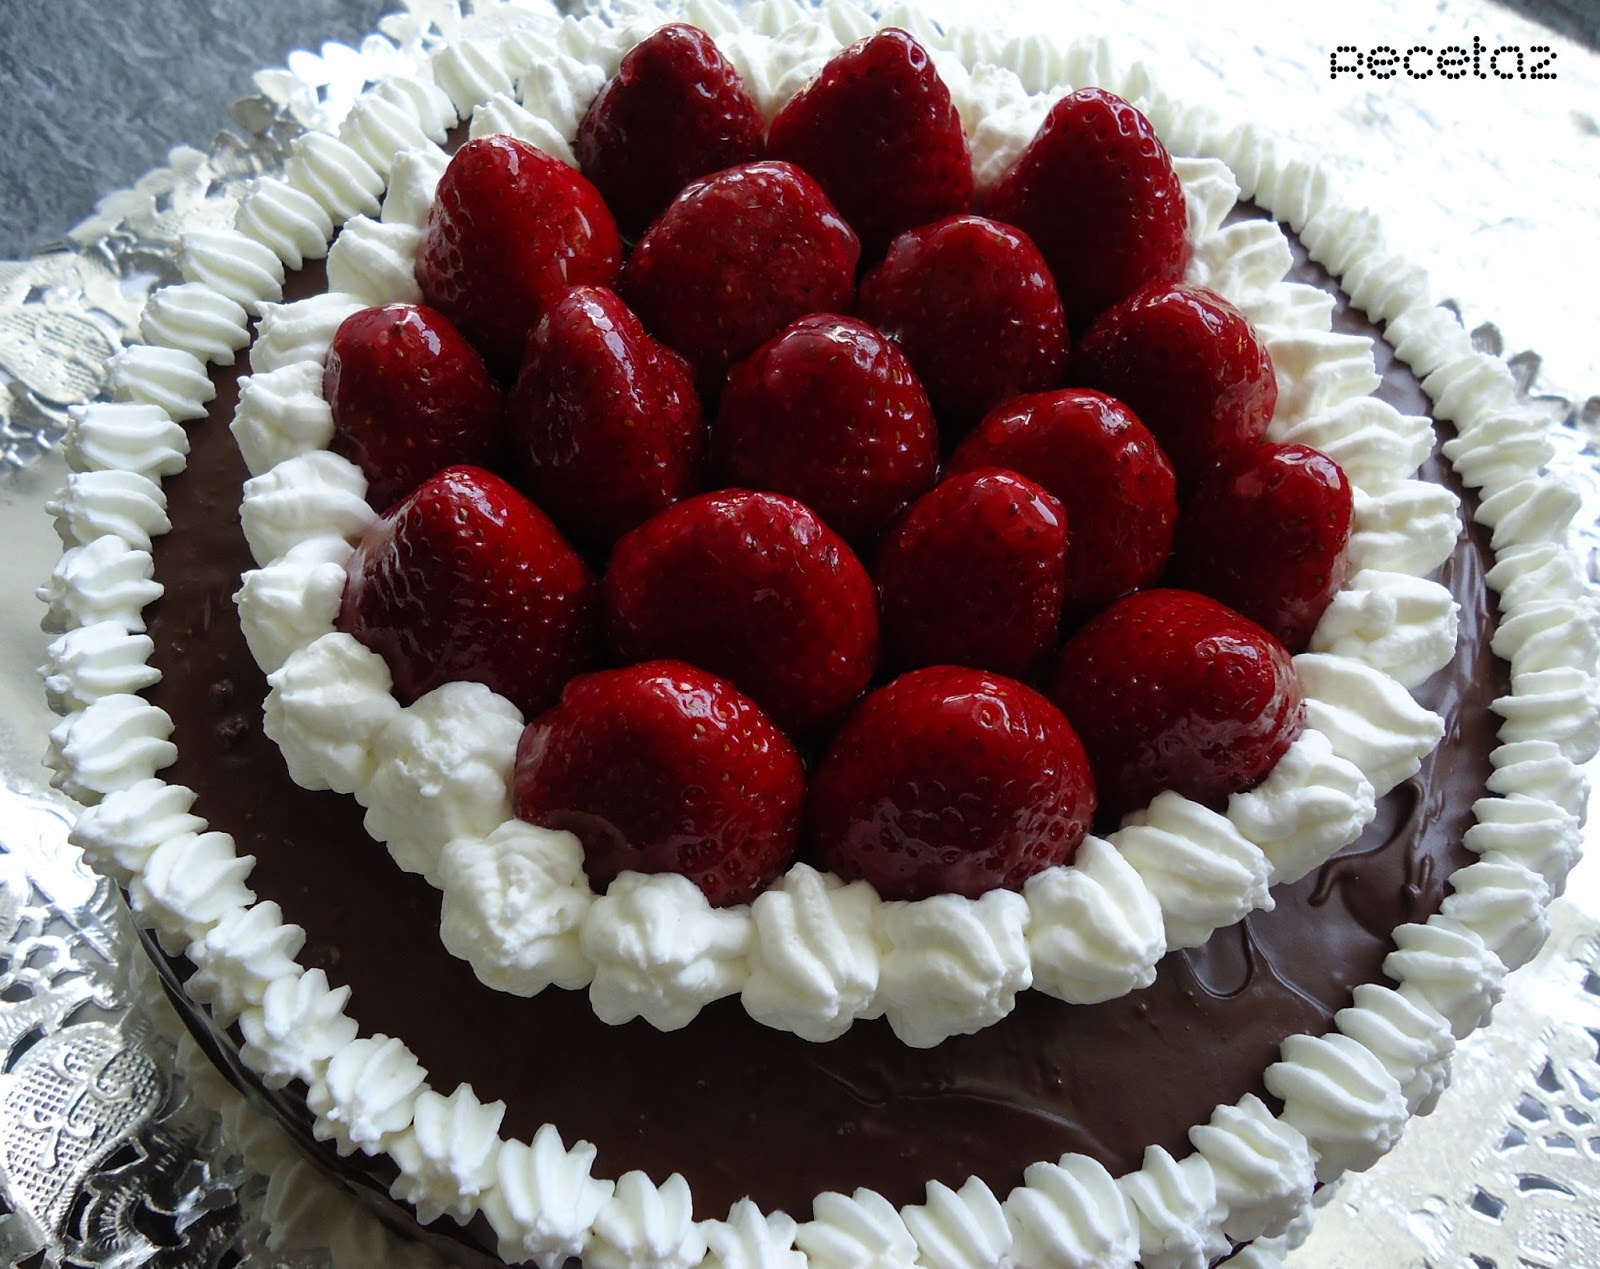 Receta2: Tarta de fresas, nata y chocolate